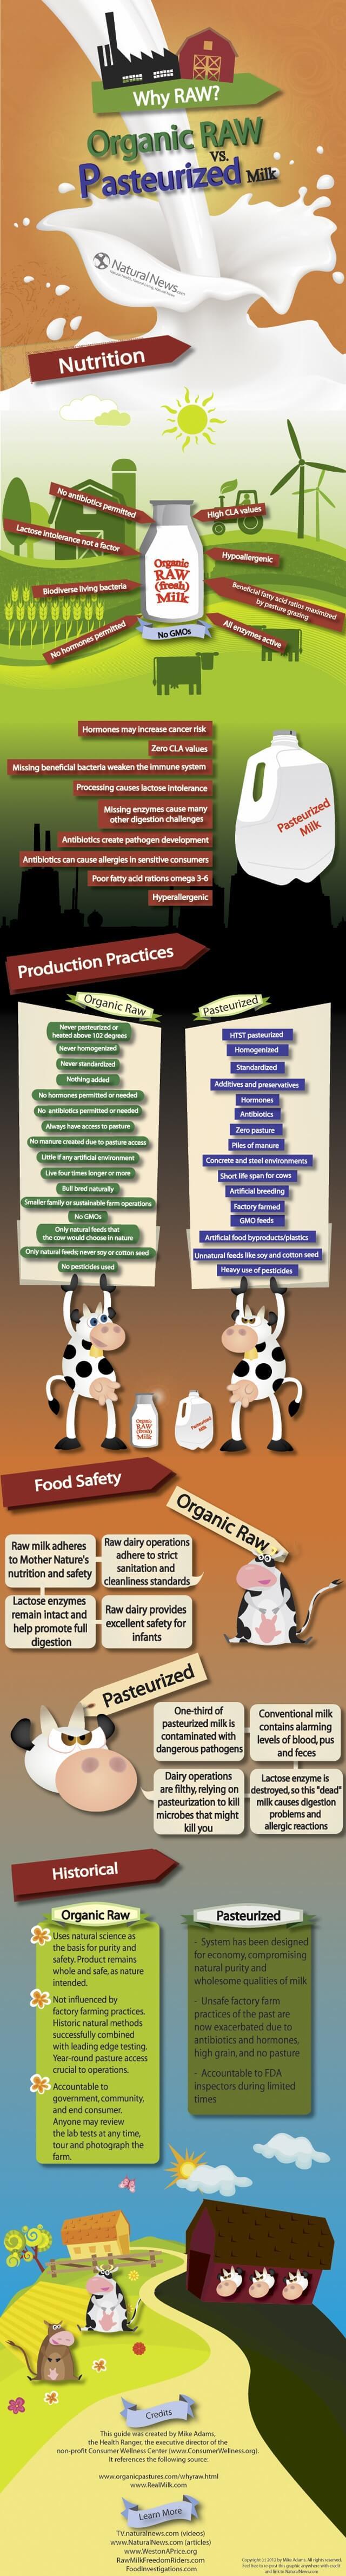 Raw-vs-Pasteurized milk